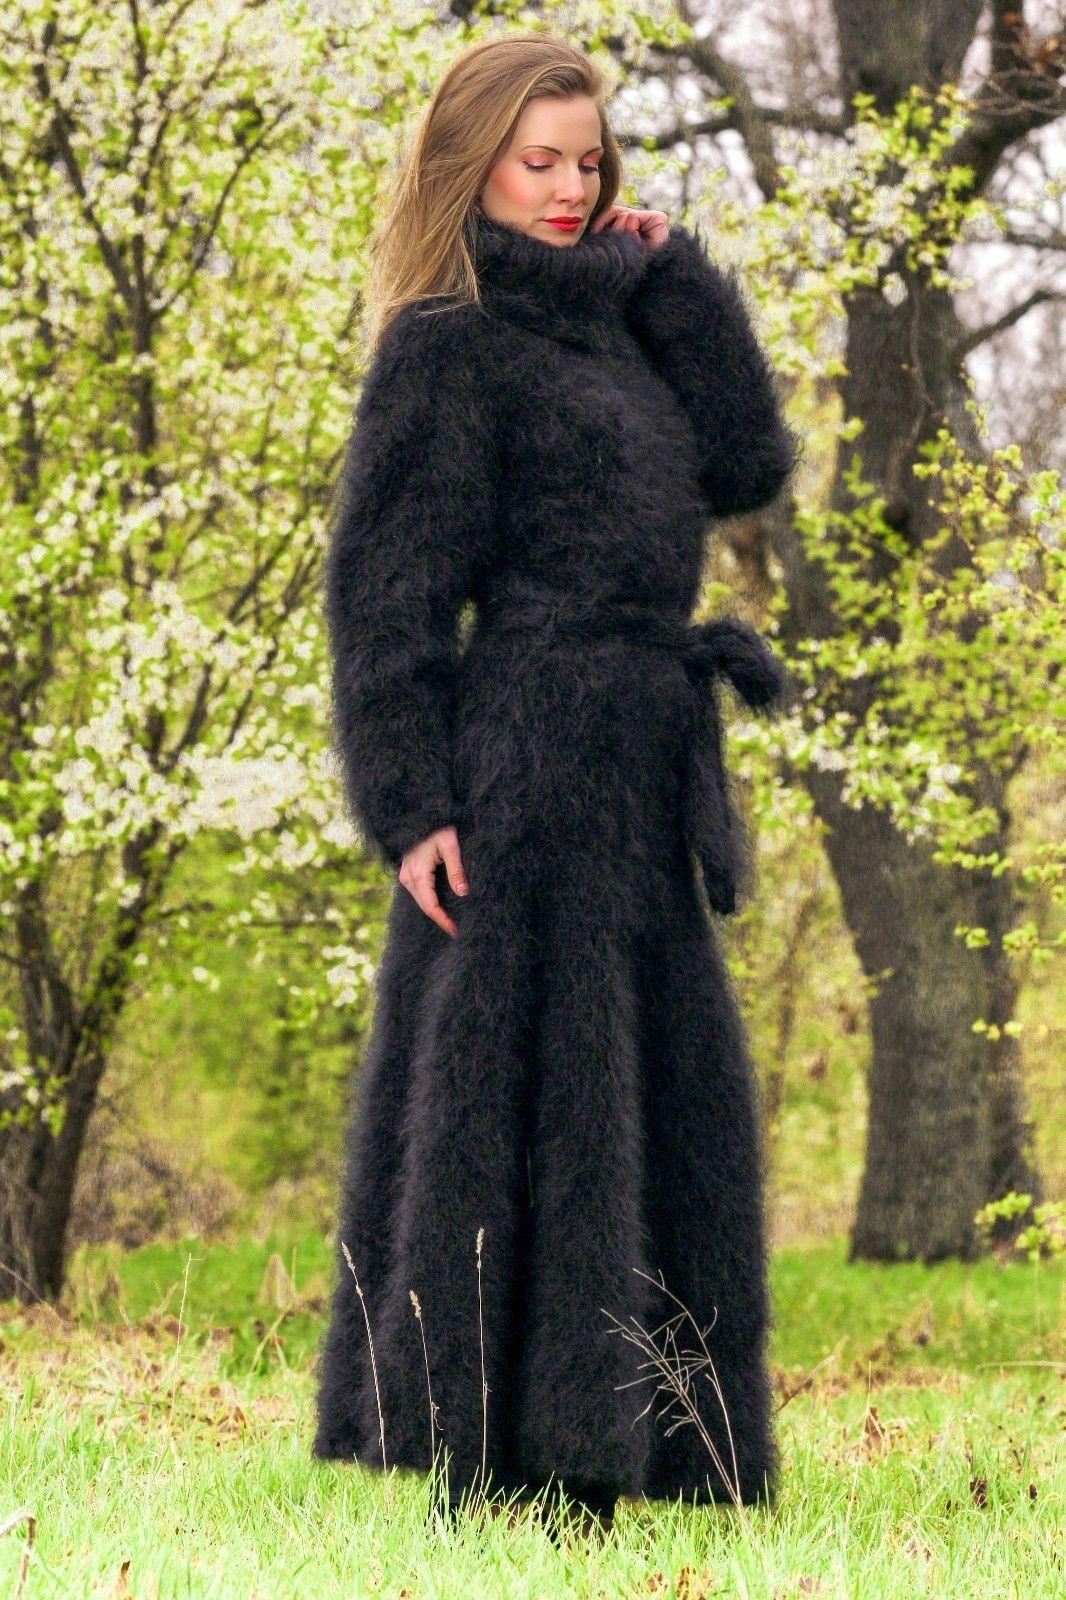 Black hand knitted mohair sweater dress supertanya fuzzy long